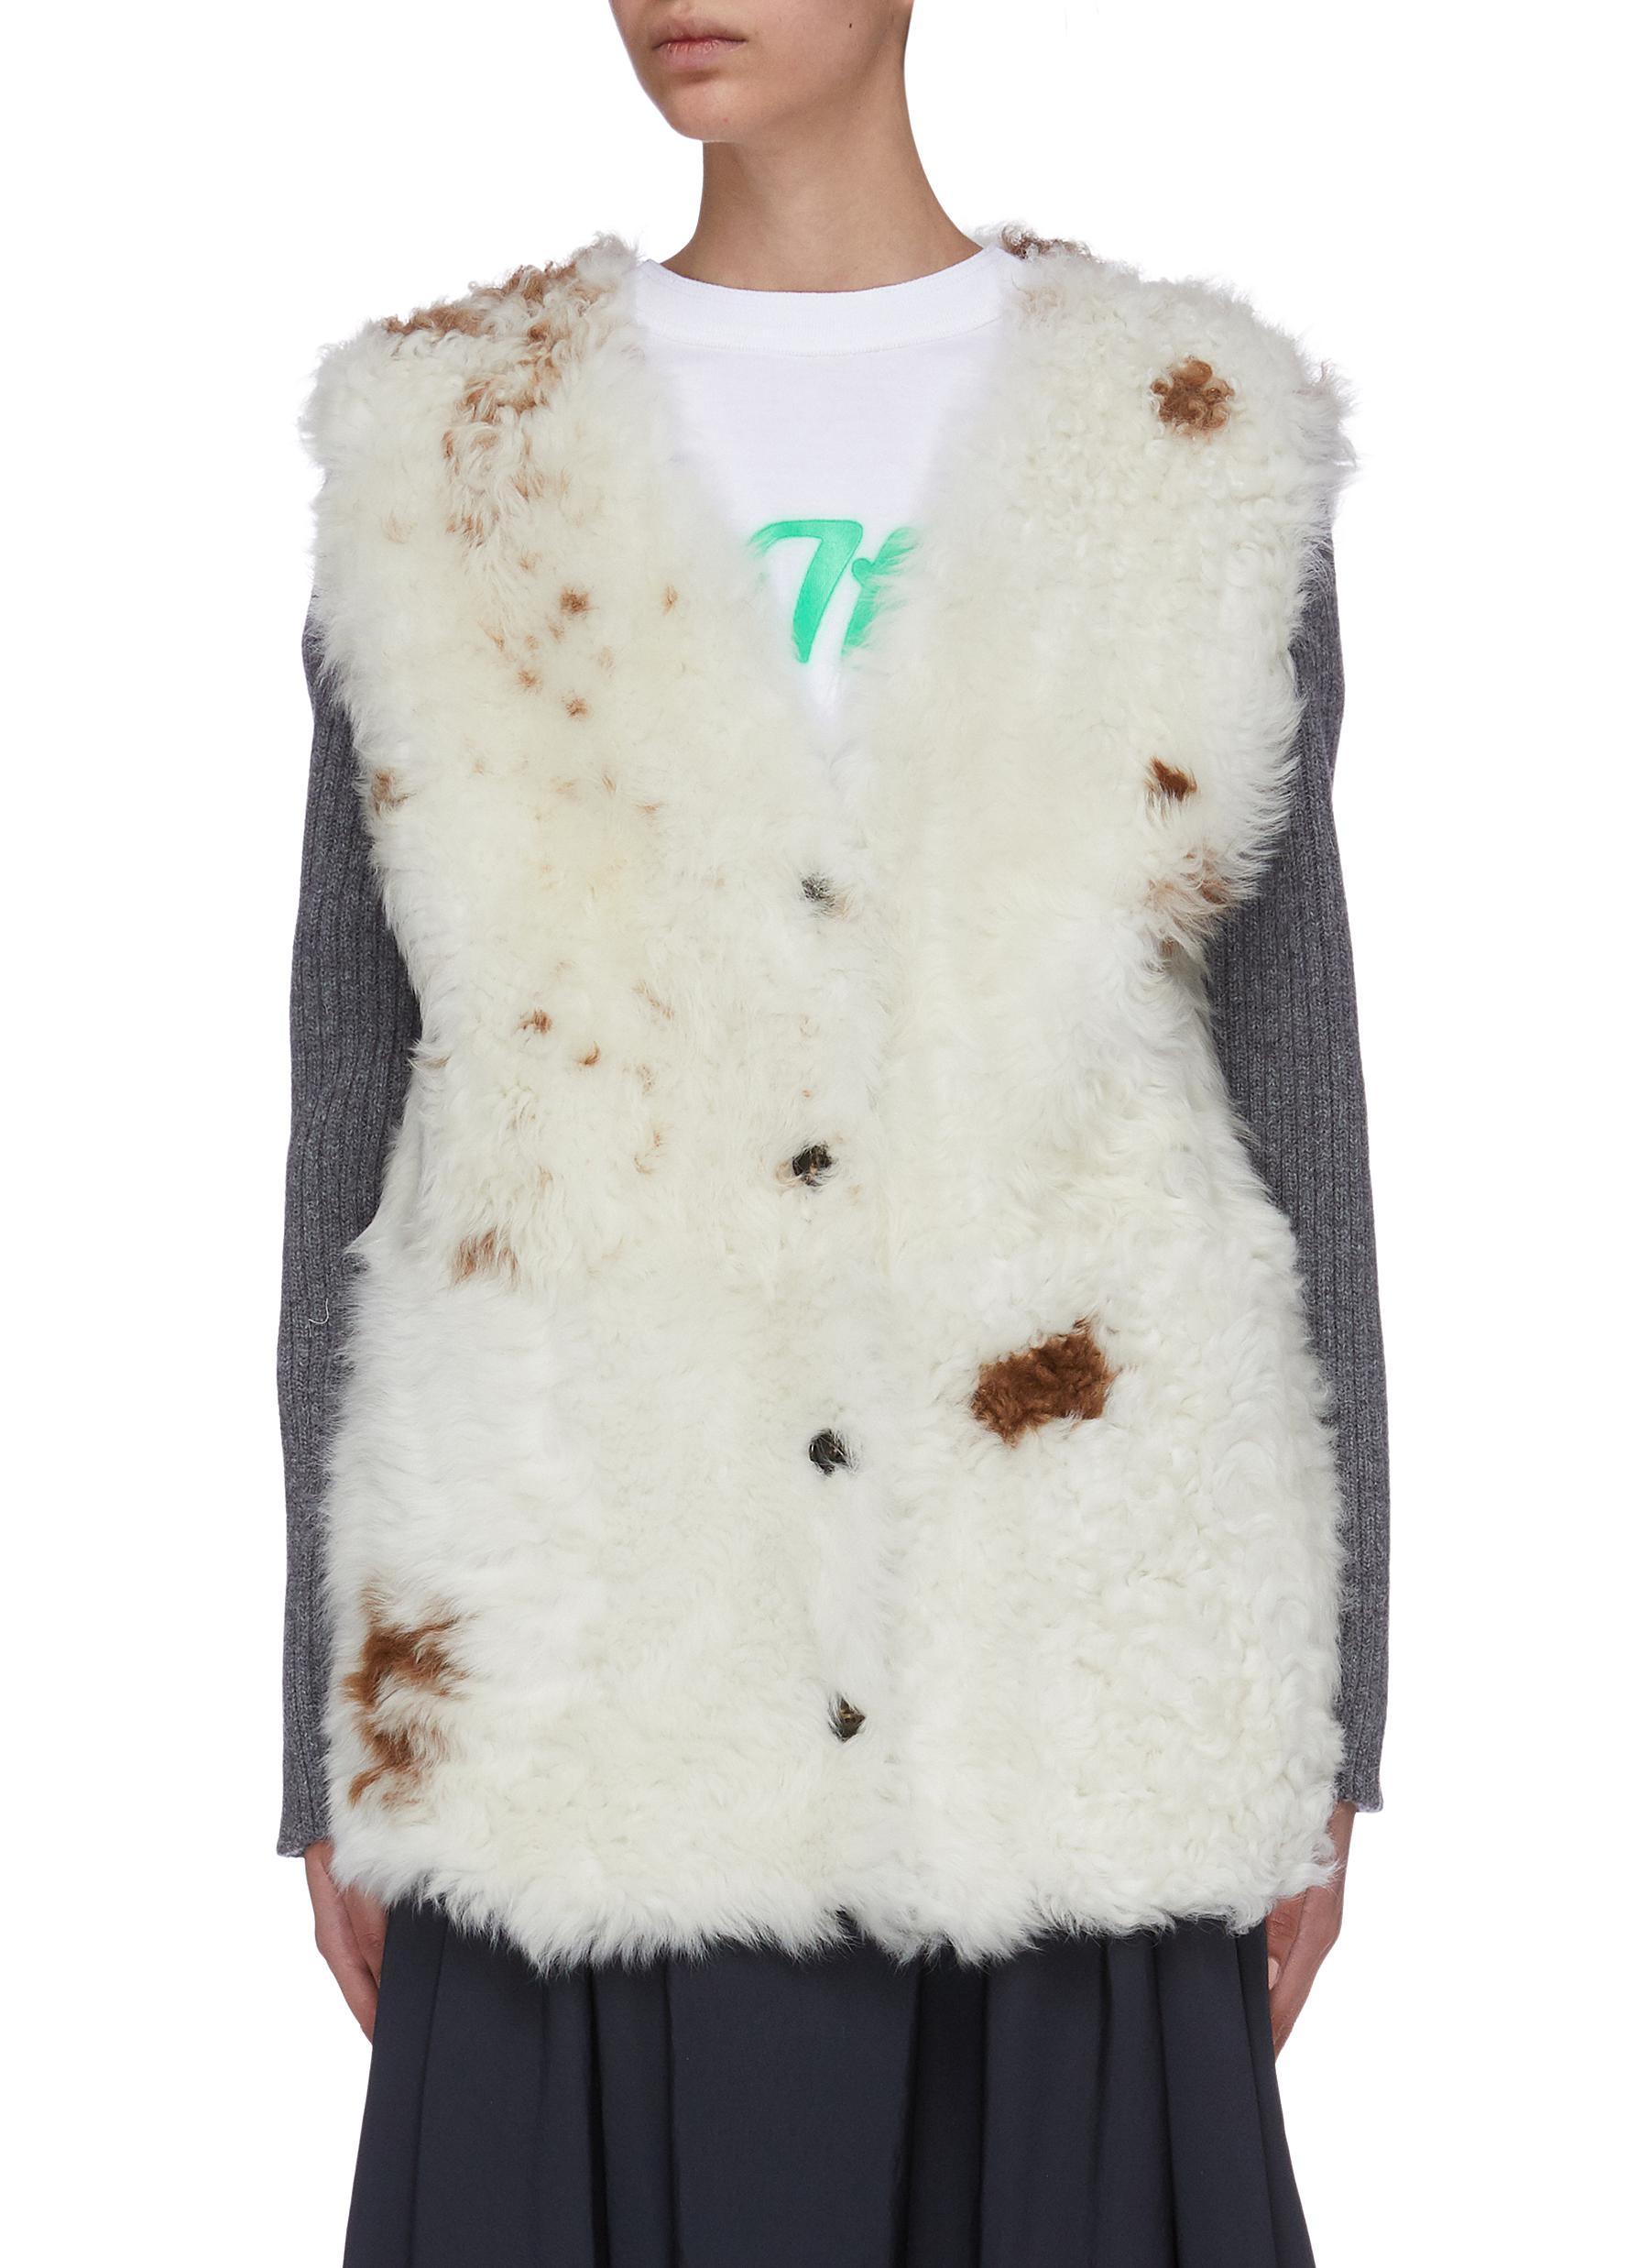 Rib knit sleeve shearling jacket by Plan C